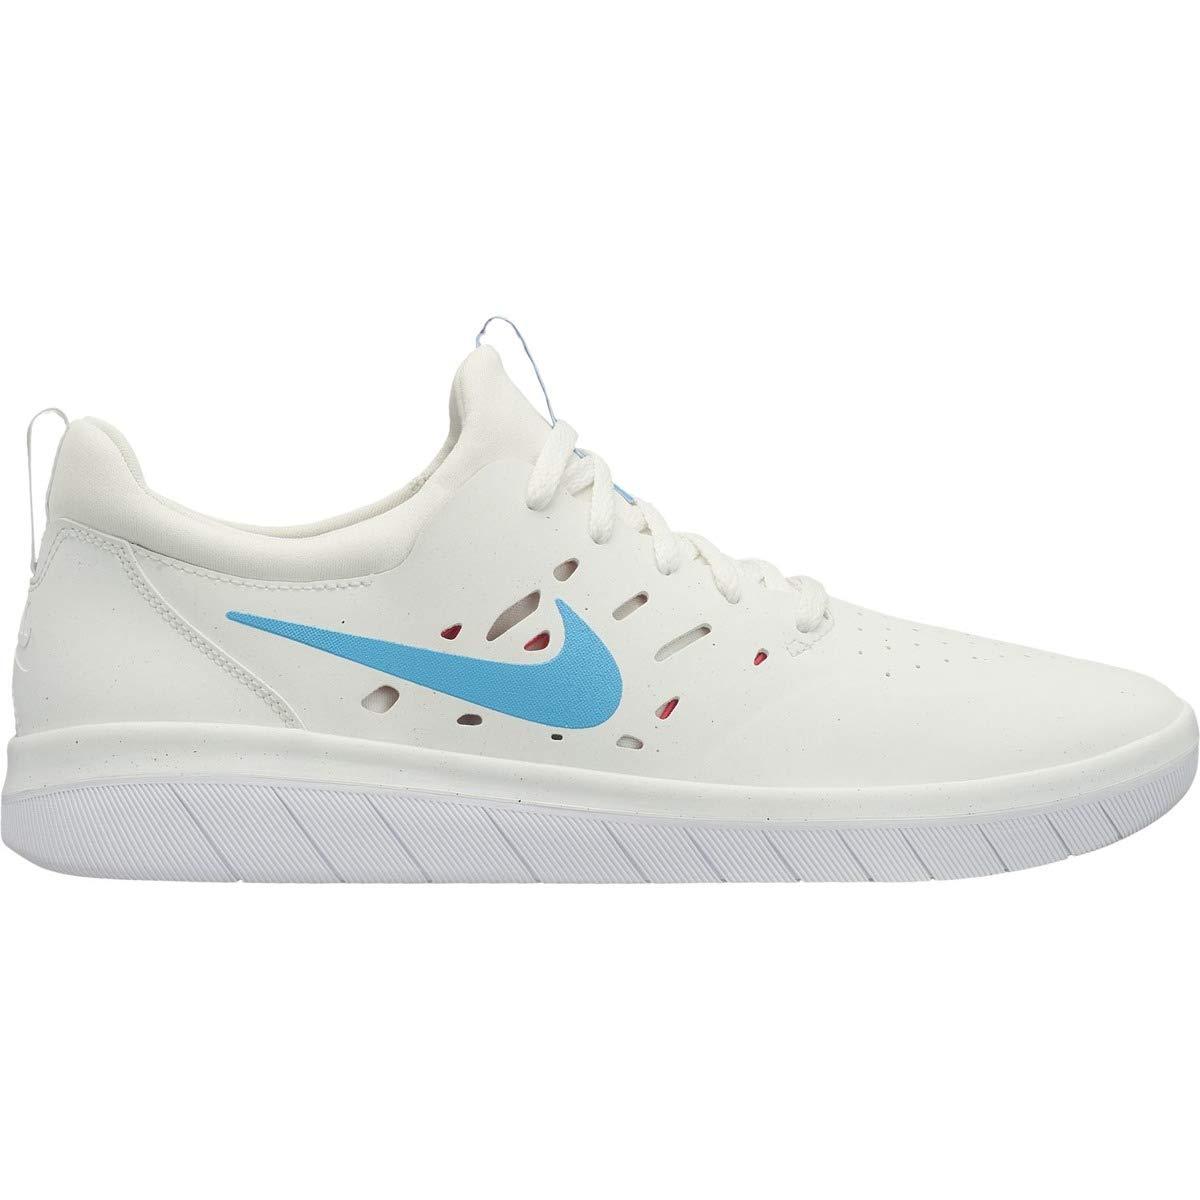 Nike Herren Sb Nyjah Free Turnschuhe